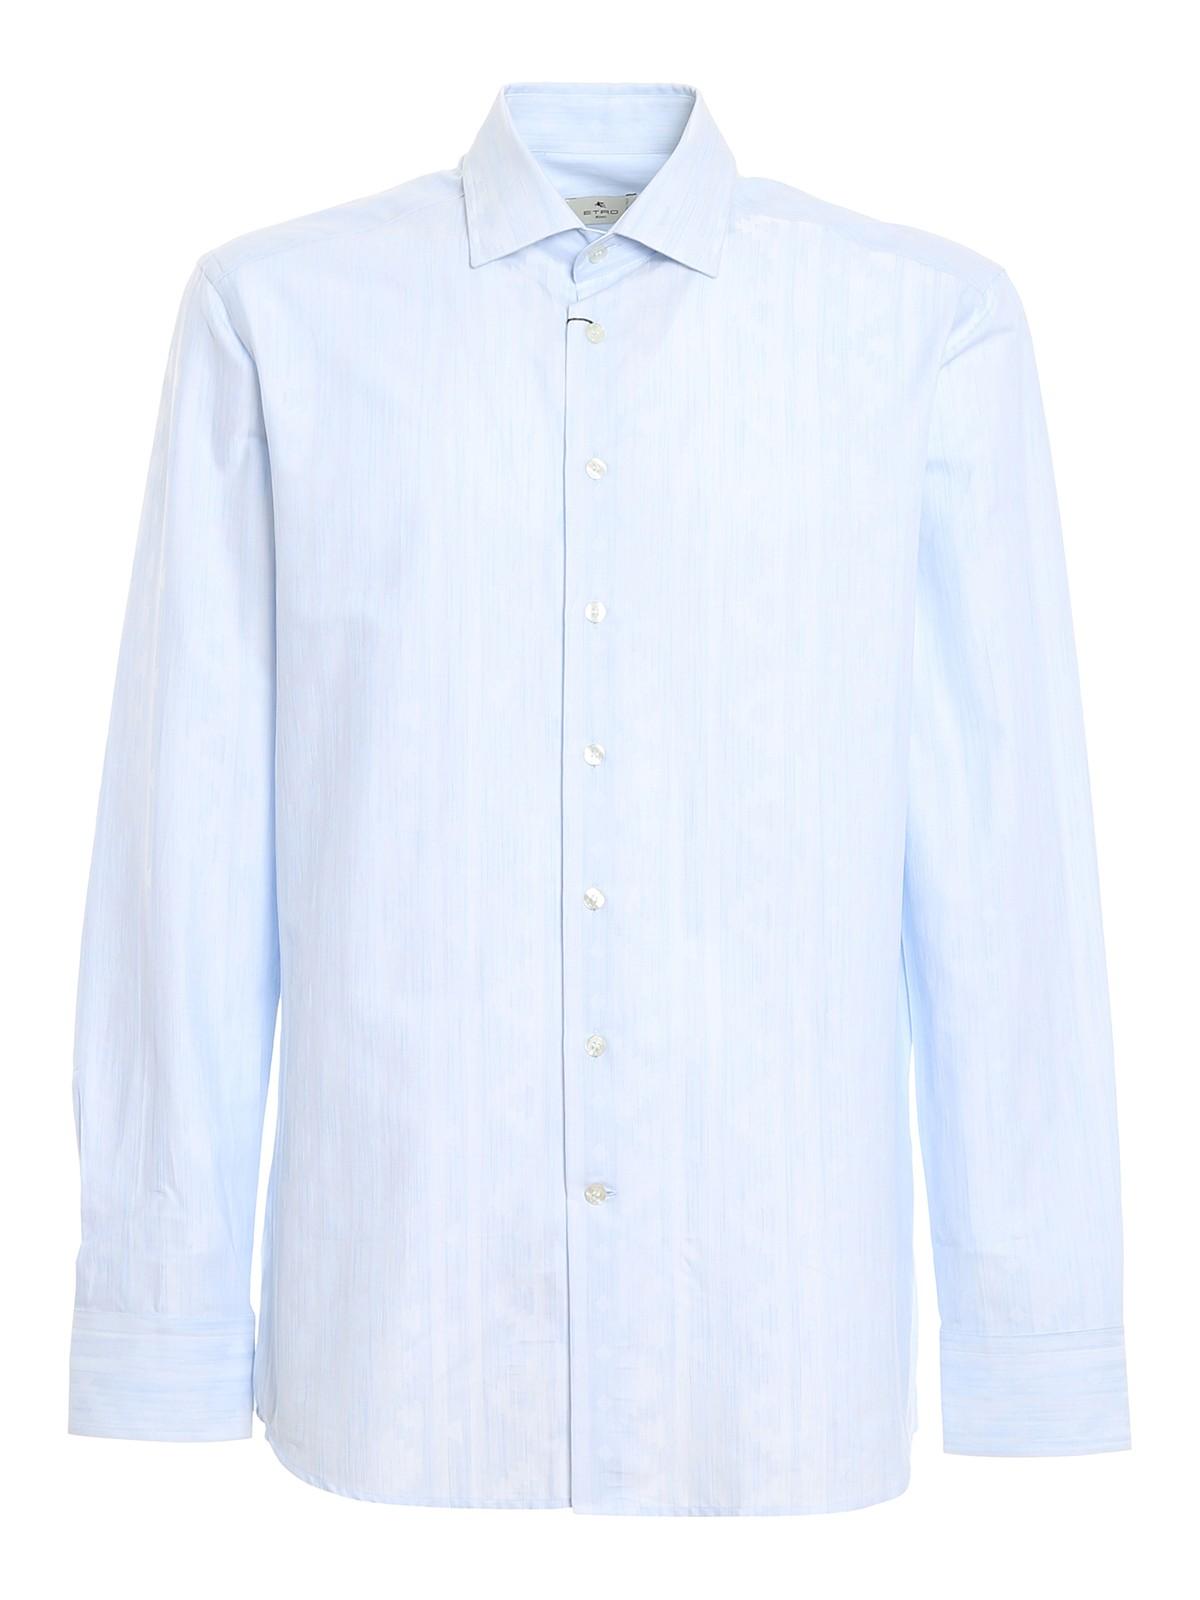 Etro Cottons GEOMETRIC NAIF PATTERNED SHIRT